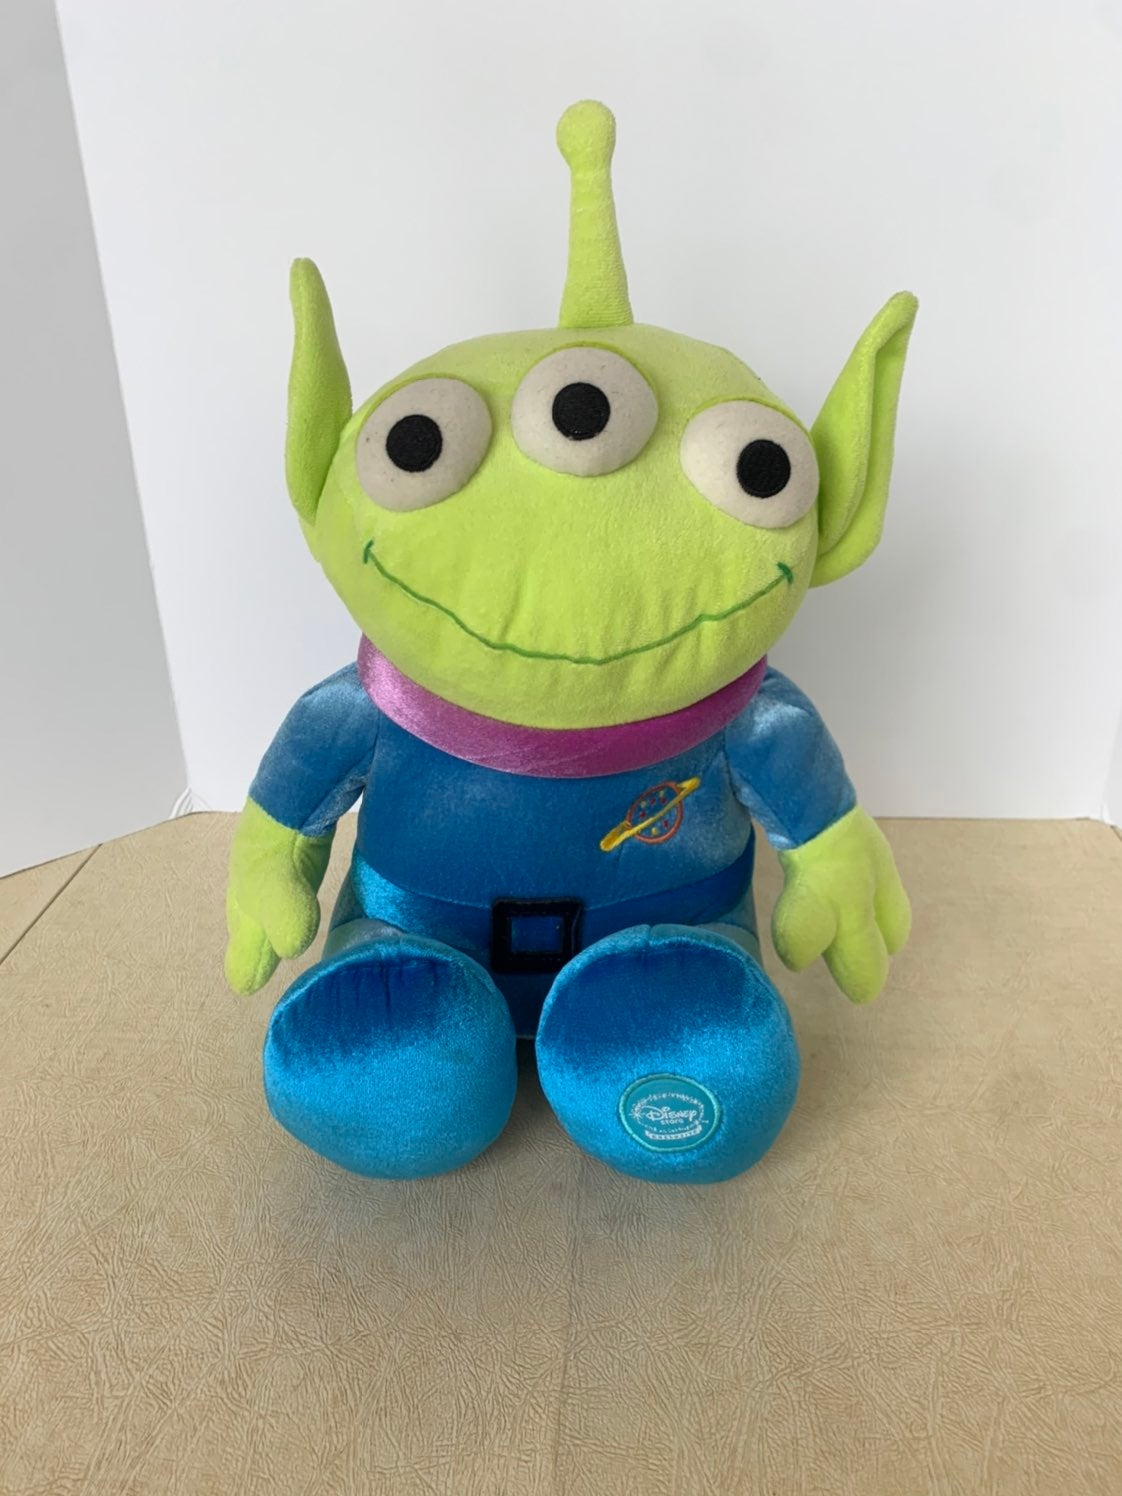 Pixar Toy Story Disney ALIEN Plush